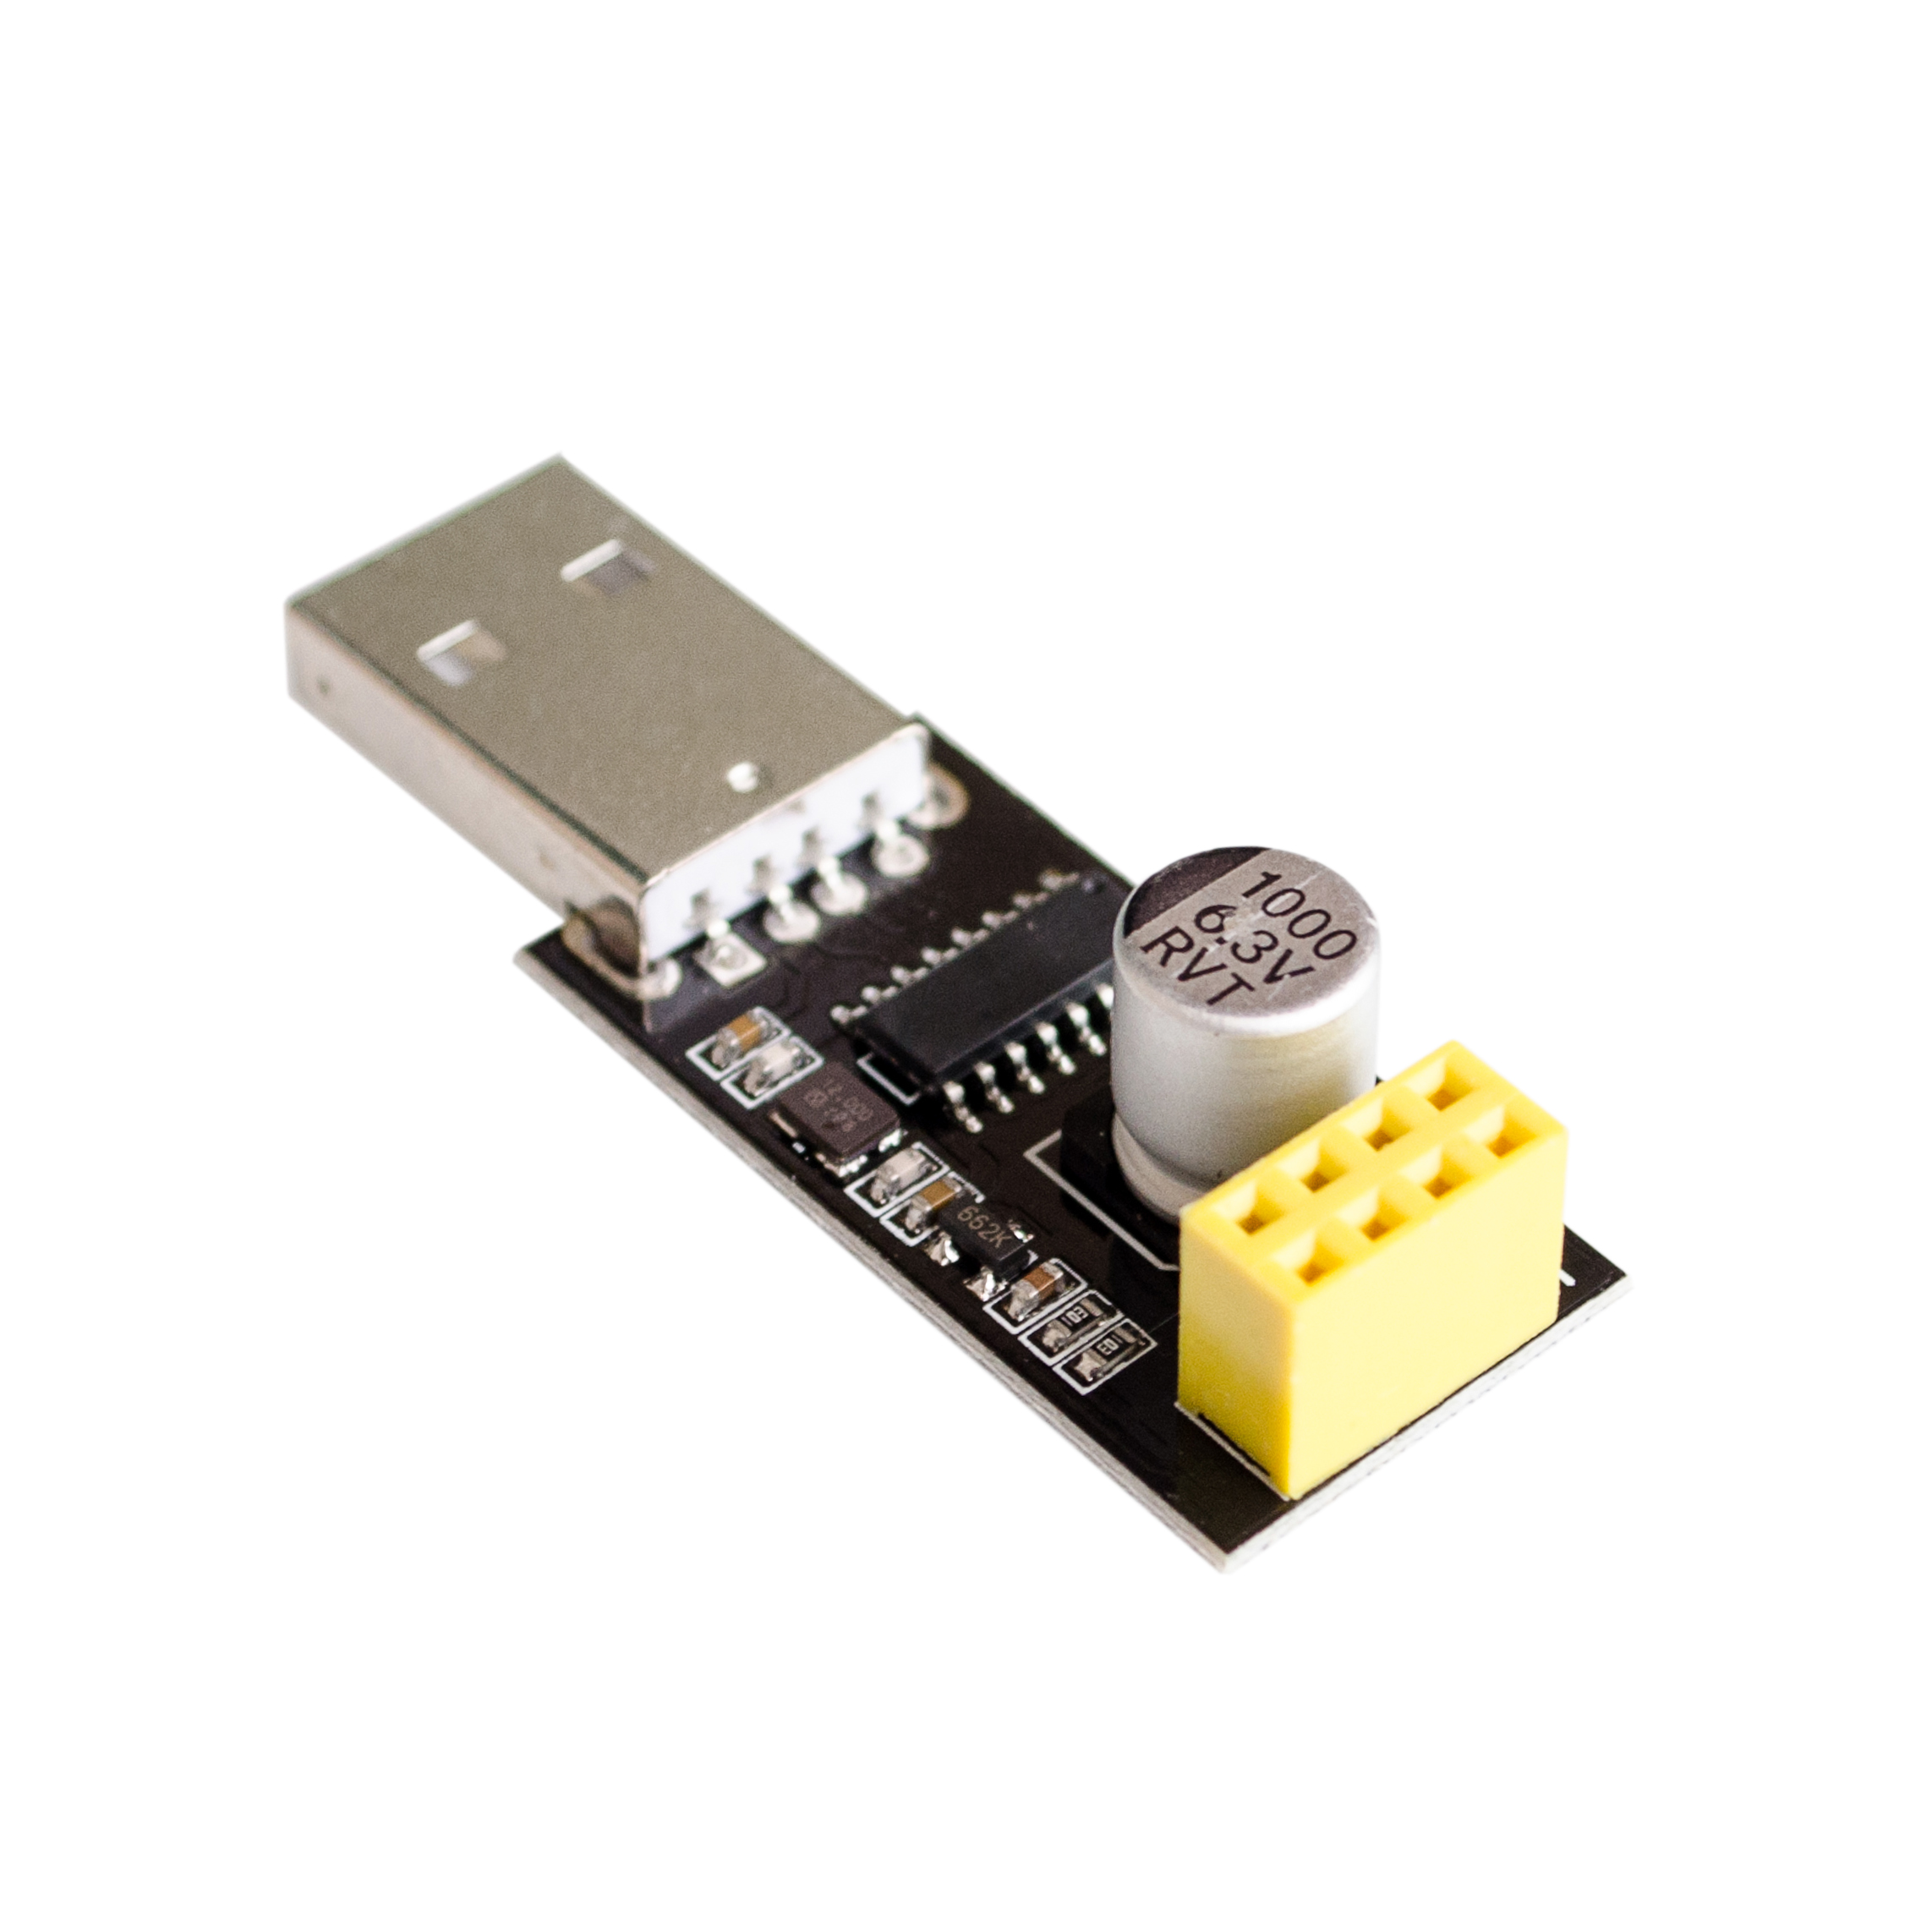 USB to ESP8266 WIFI module adapter board computer phone WIFI wireless communication microcontroller development(China (Mainland))